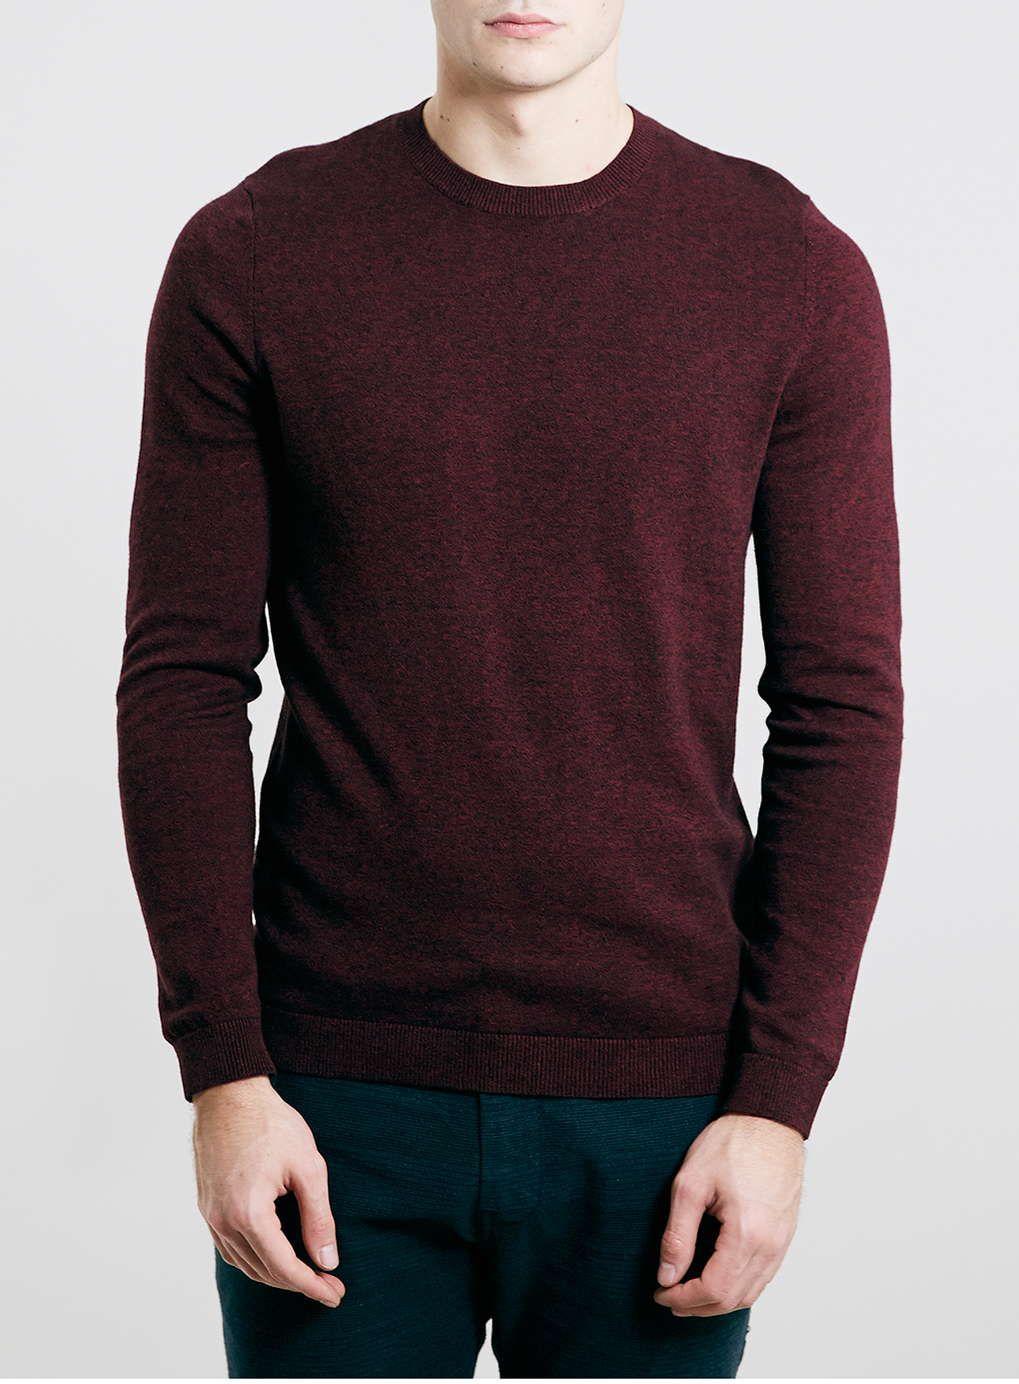 Burgundy/Black Cotton Twist Crew Neck Sweater - Plain Sweaters